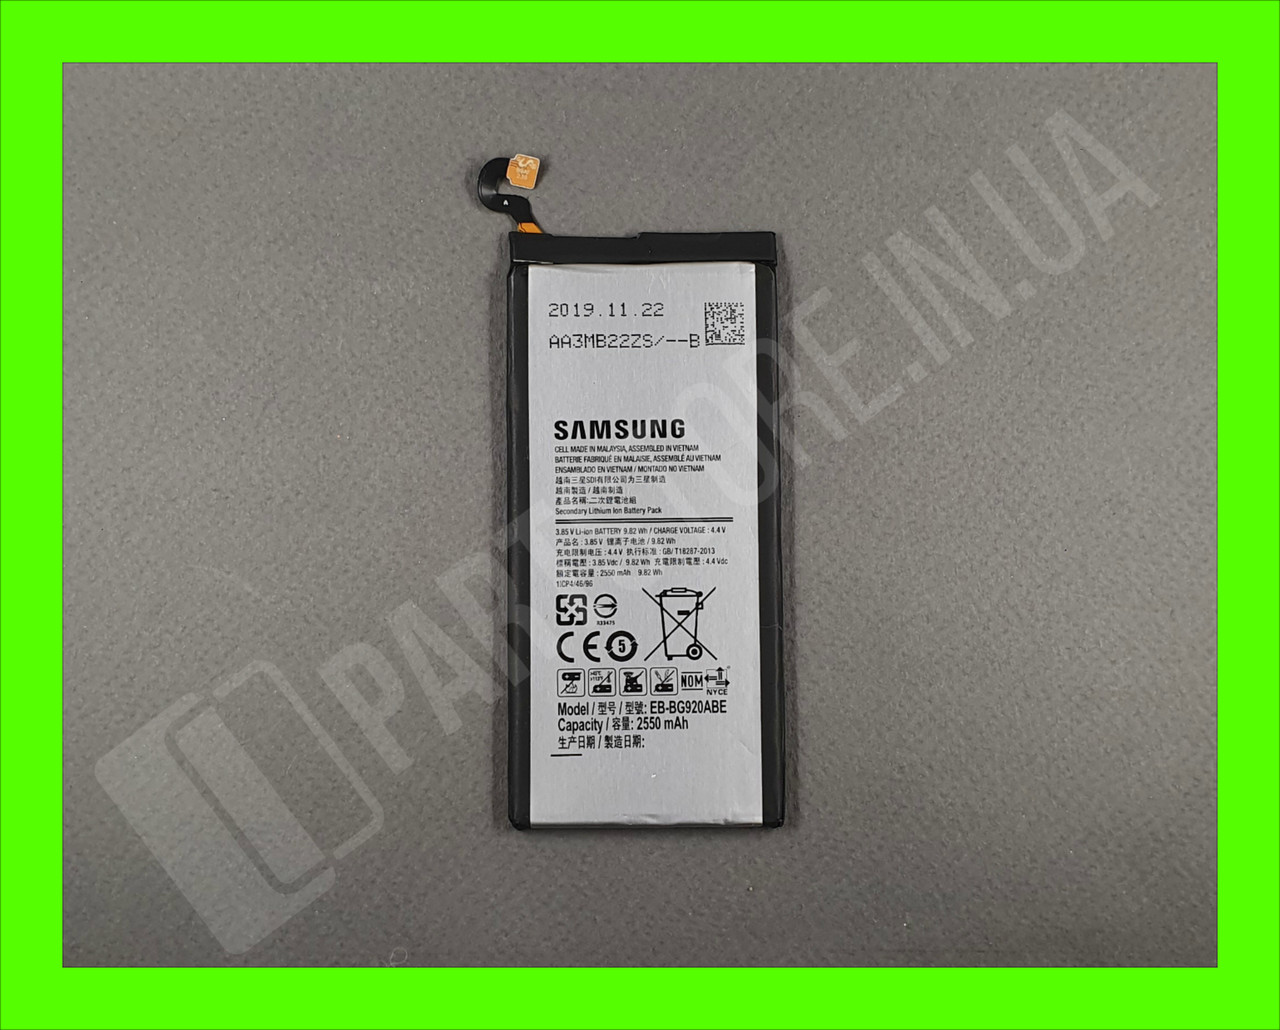 Аккумулятор Samsung g920 s6 (EB-BG920ABE) GH43-04413B сервисный оригинал